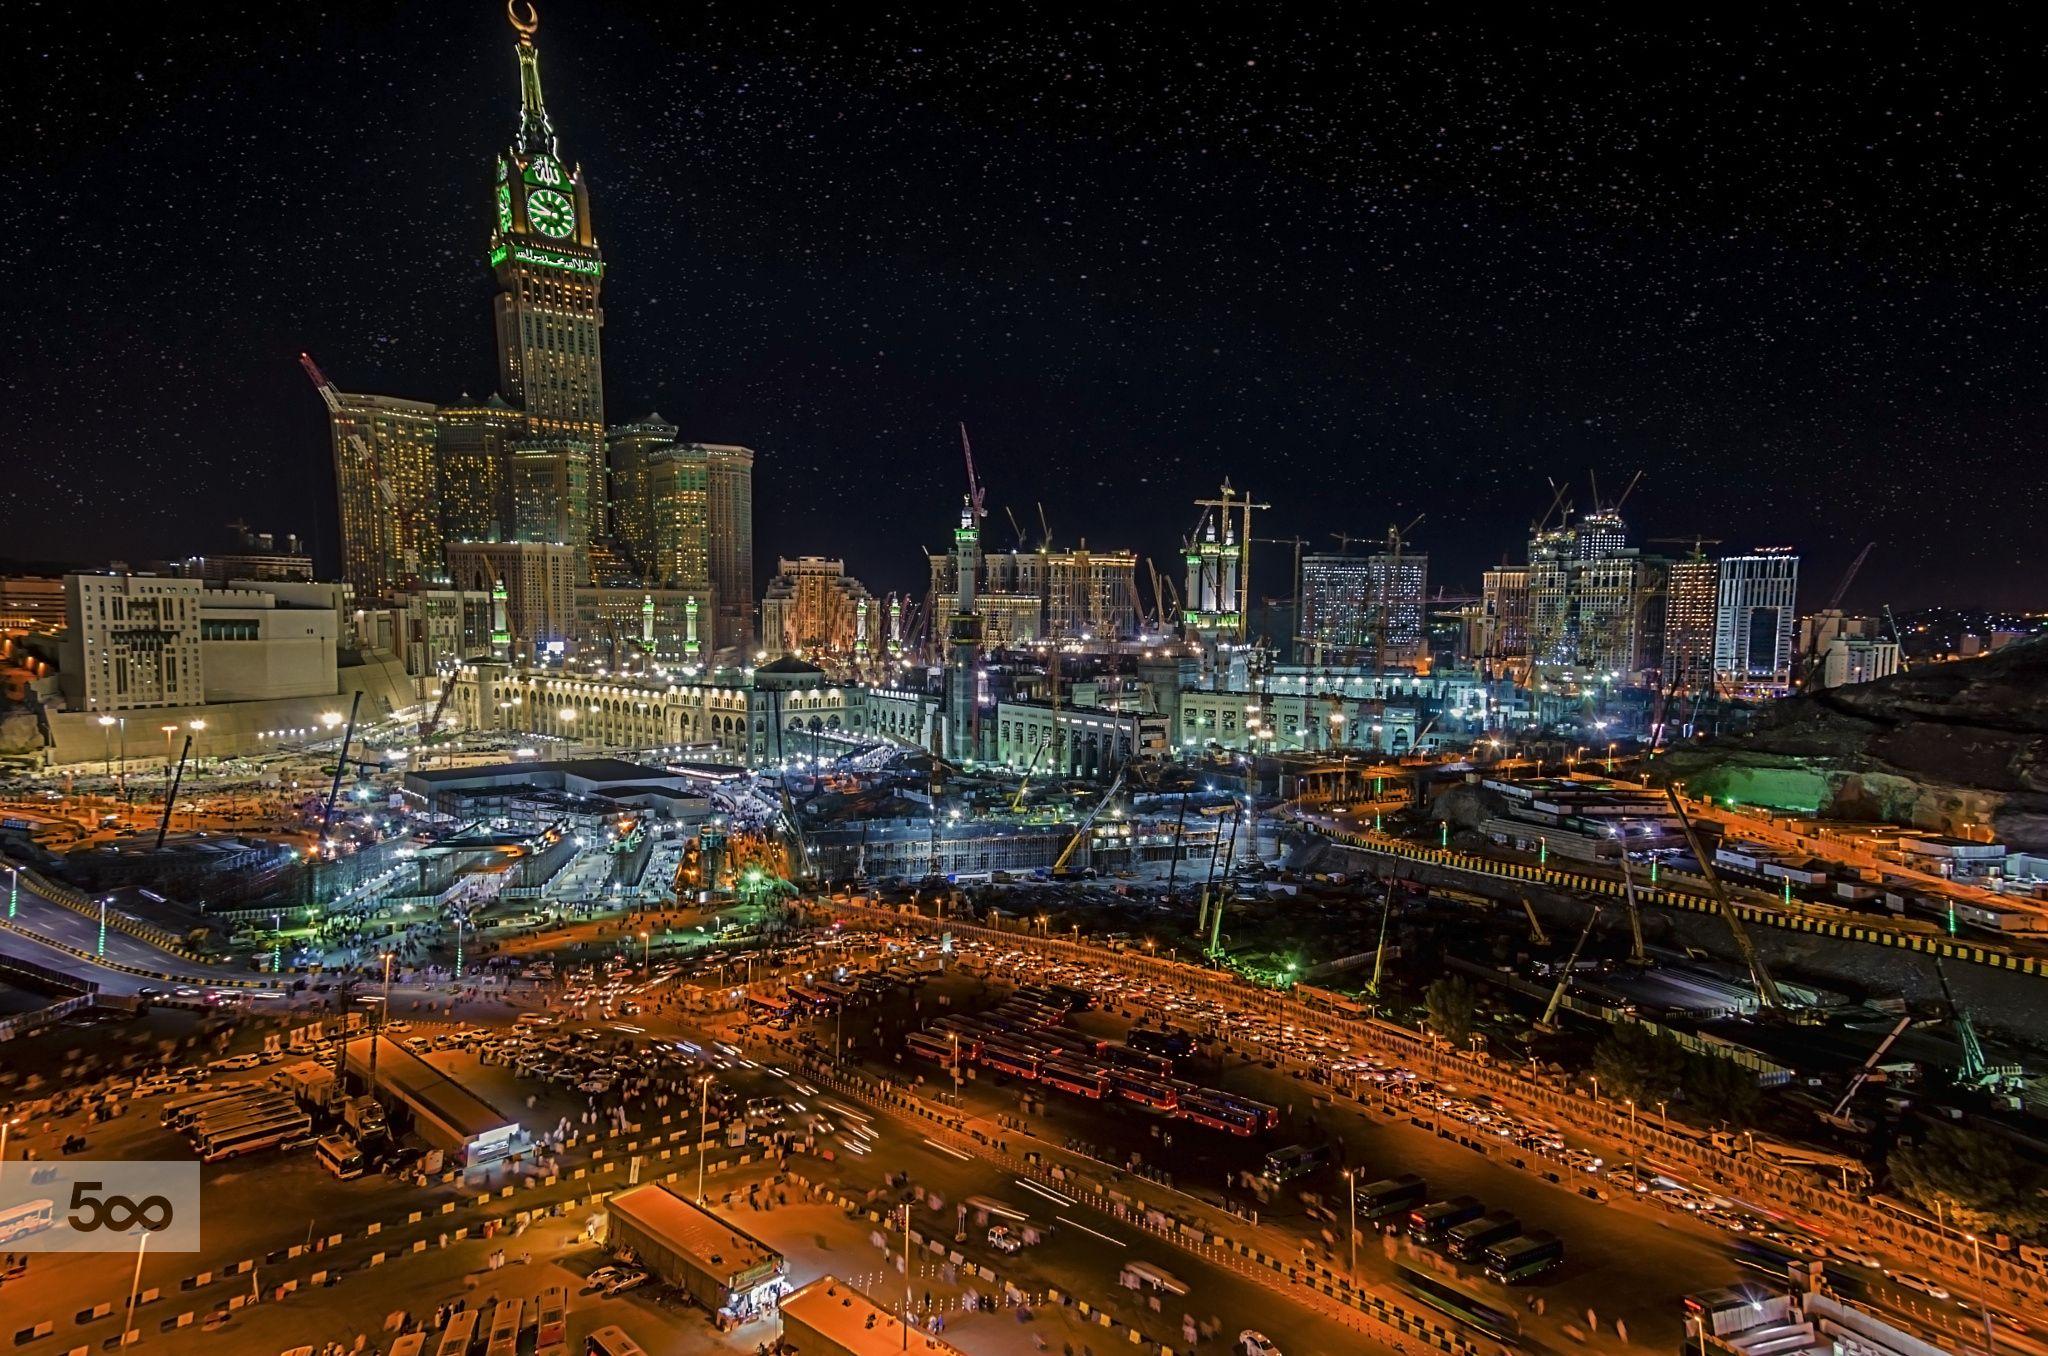 Grand Mosque of Makkah